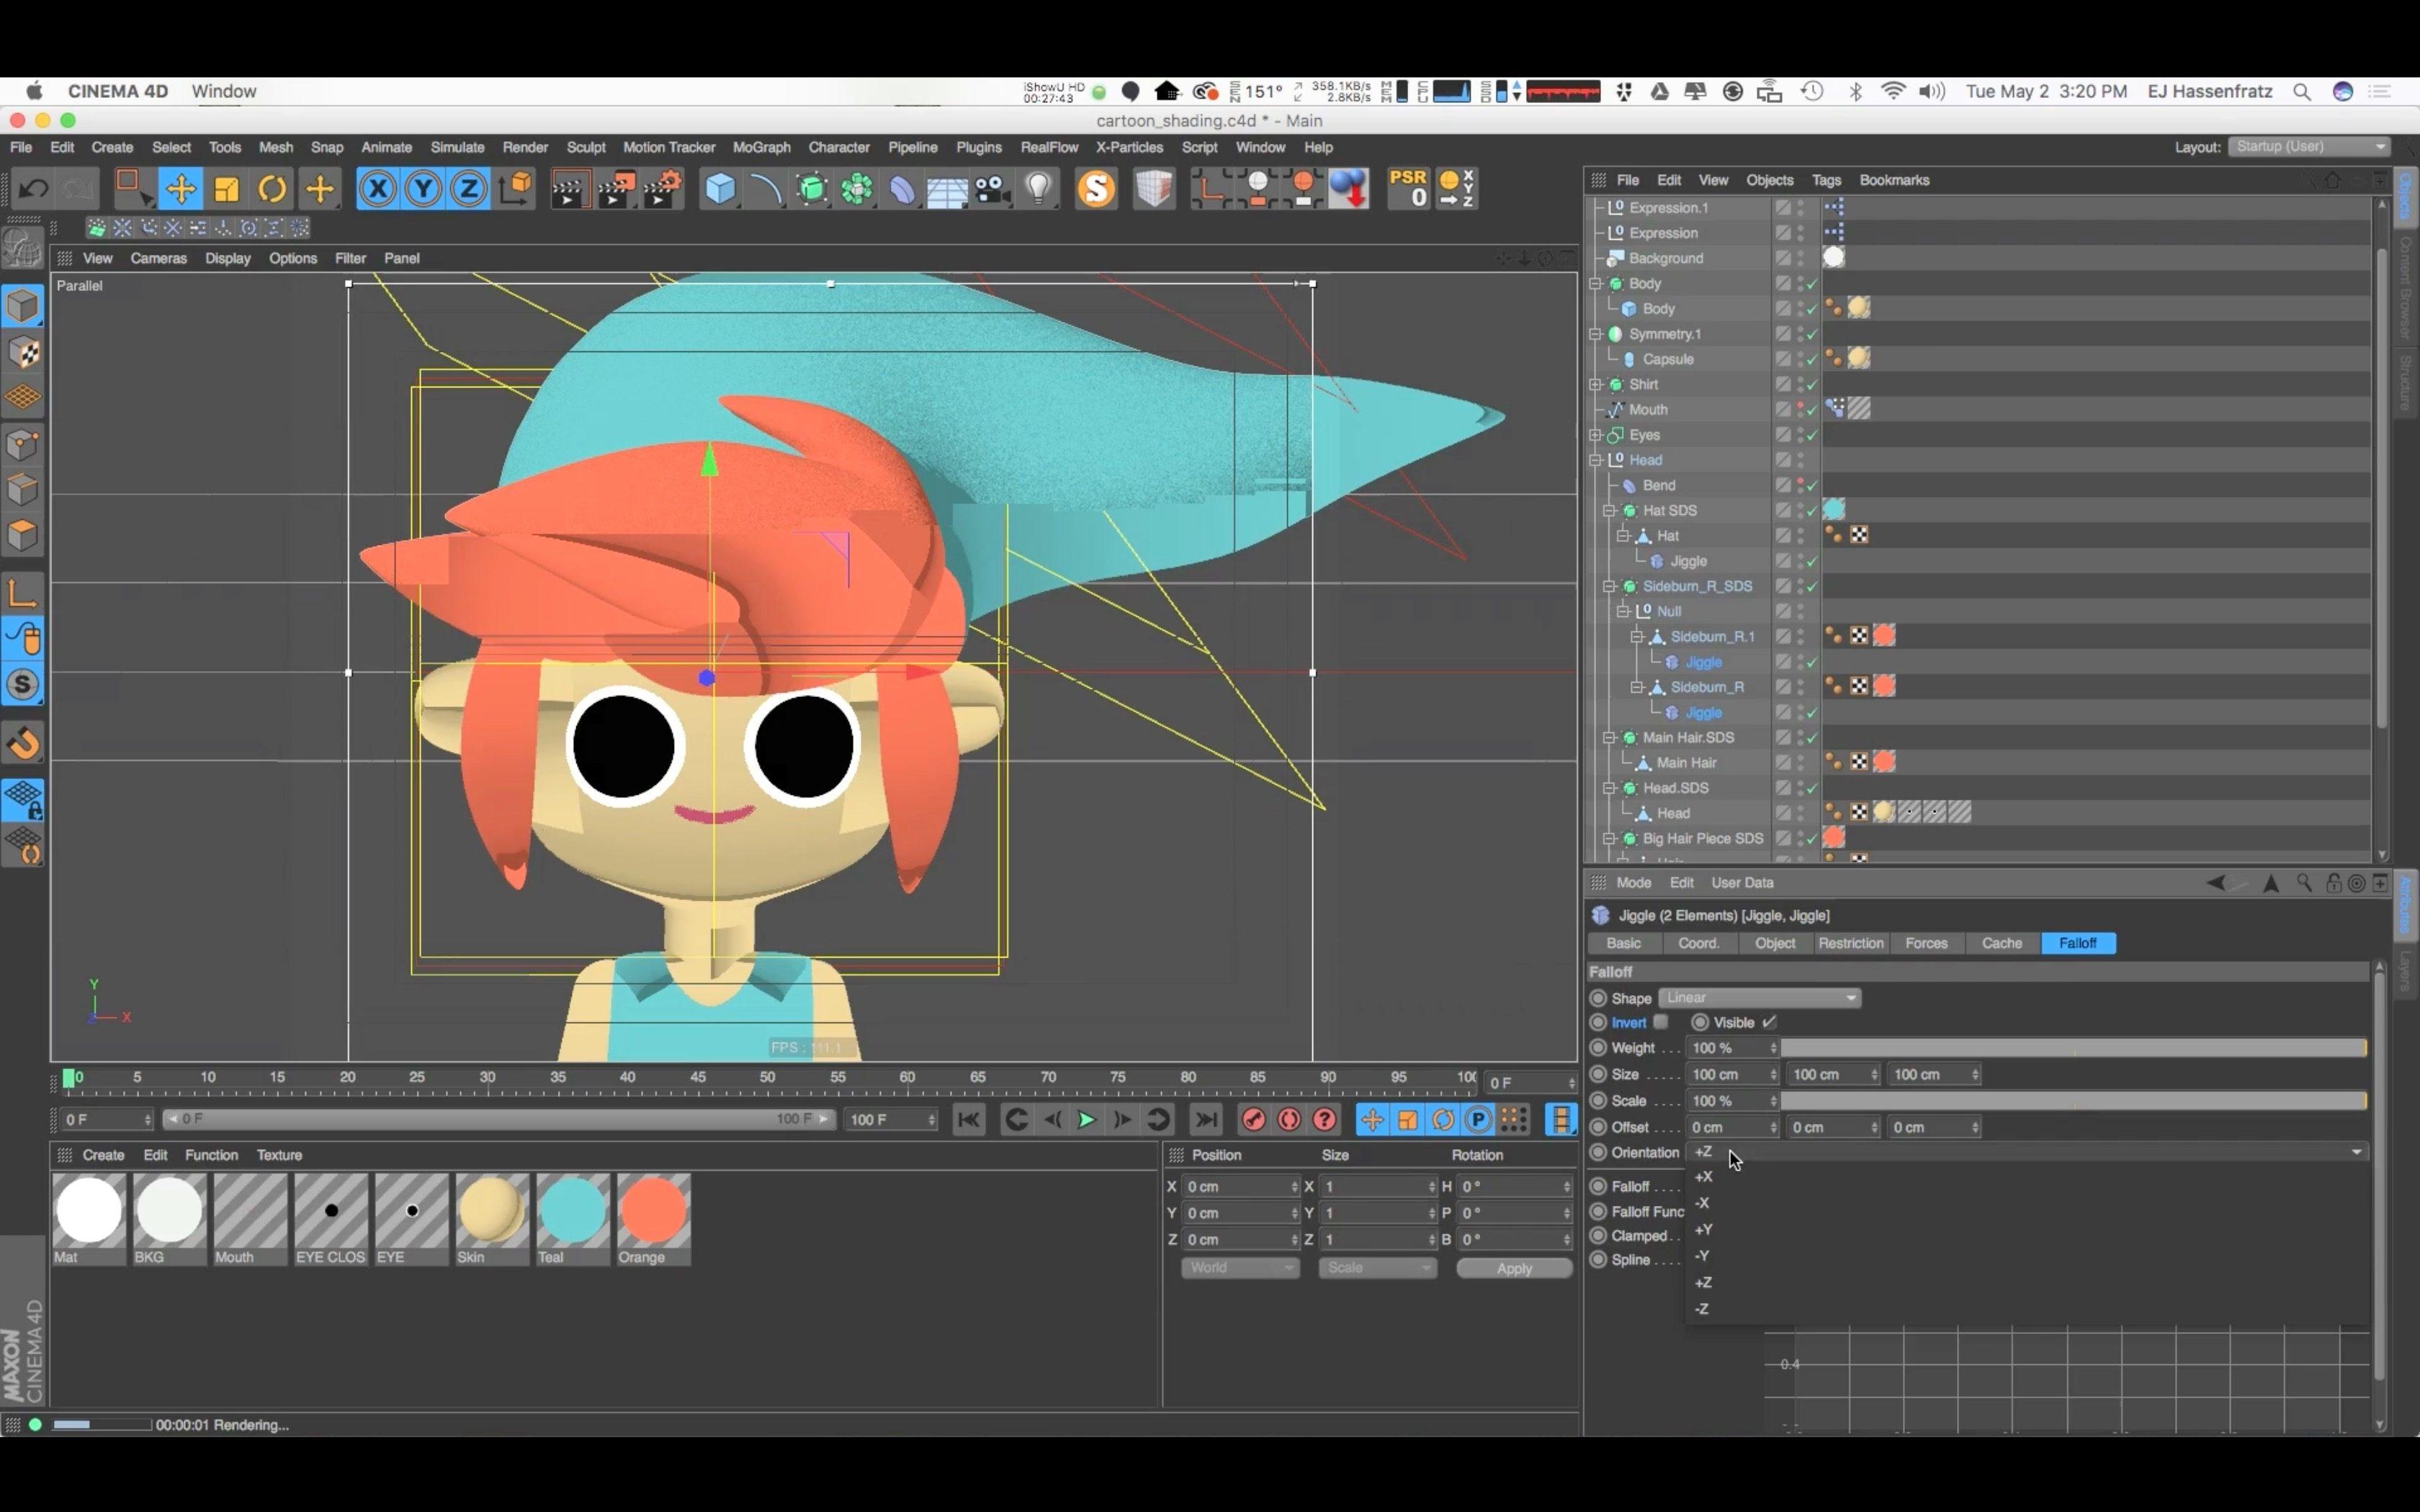 Tutorial: Creating a Cartoon Render Using the Cel Shader in Cinema 4d